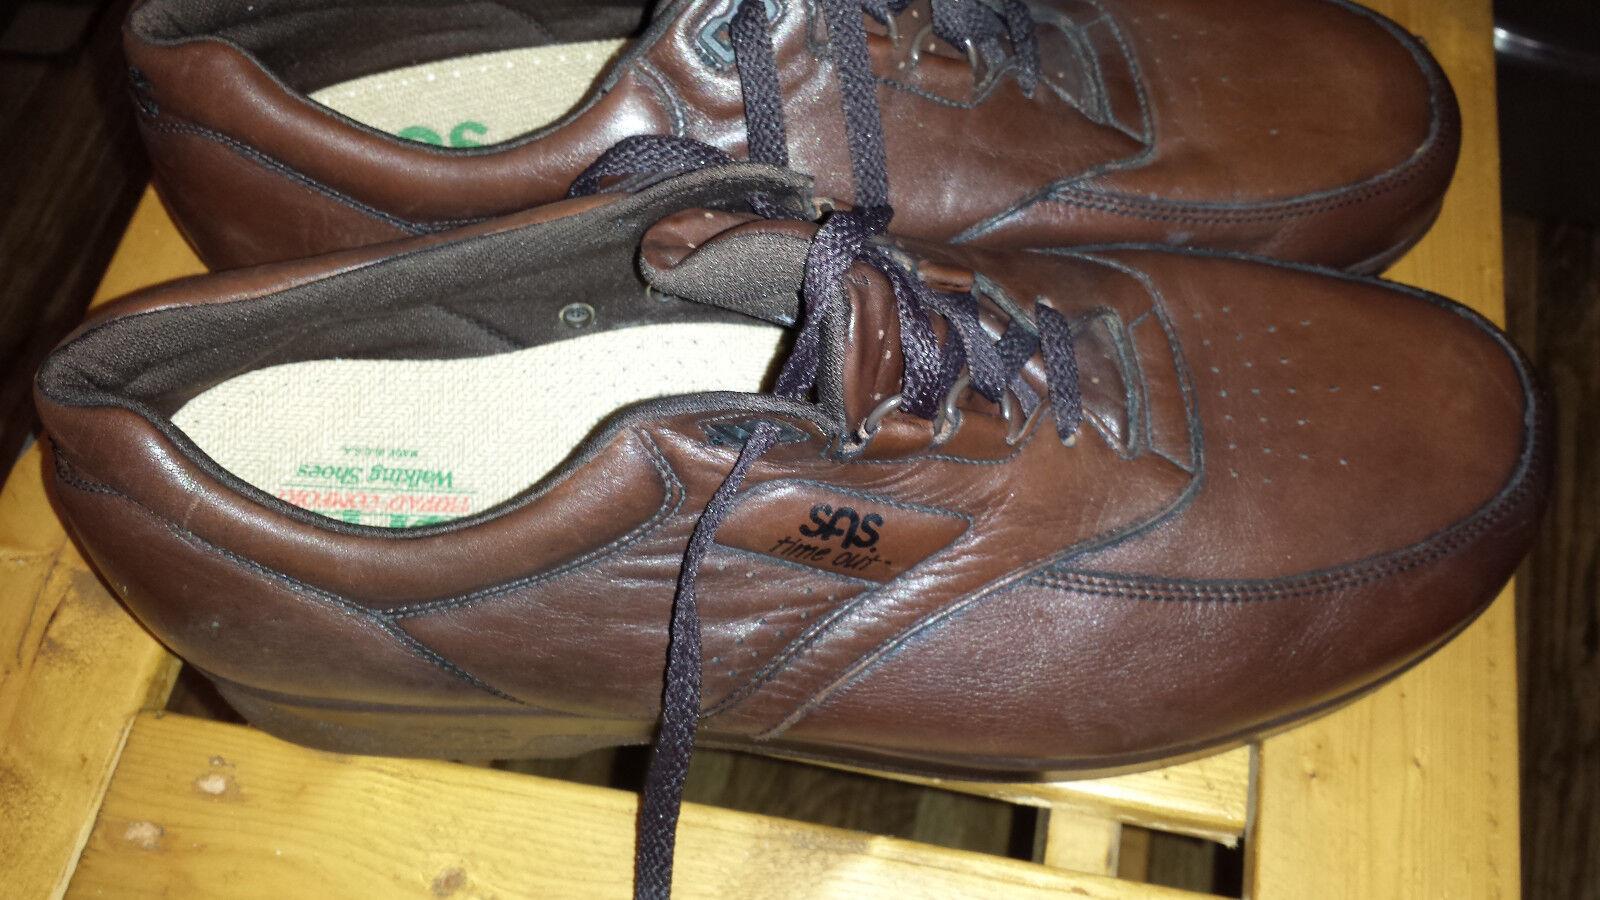 SAS Tripad Comfort Time Out Men's Brown Leather Sport Oxfords Shoes 15 M